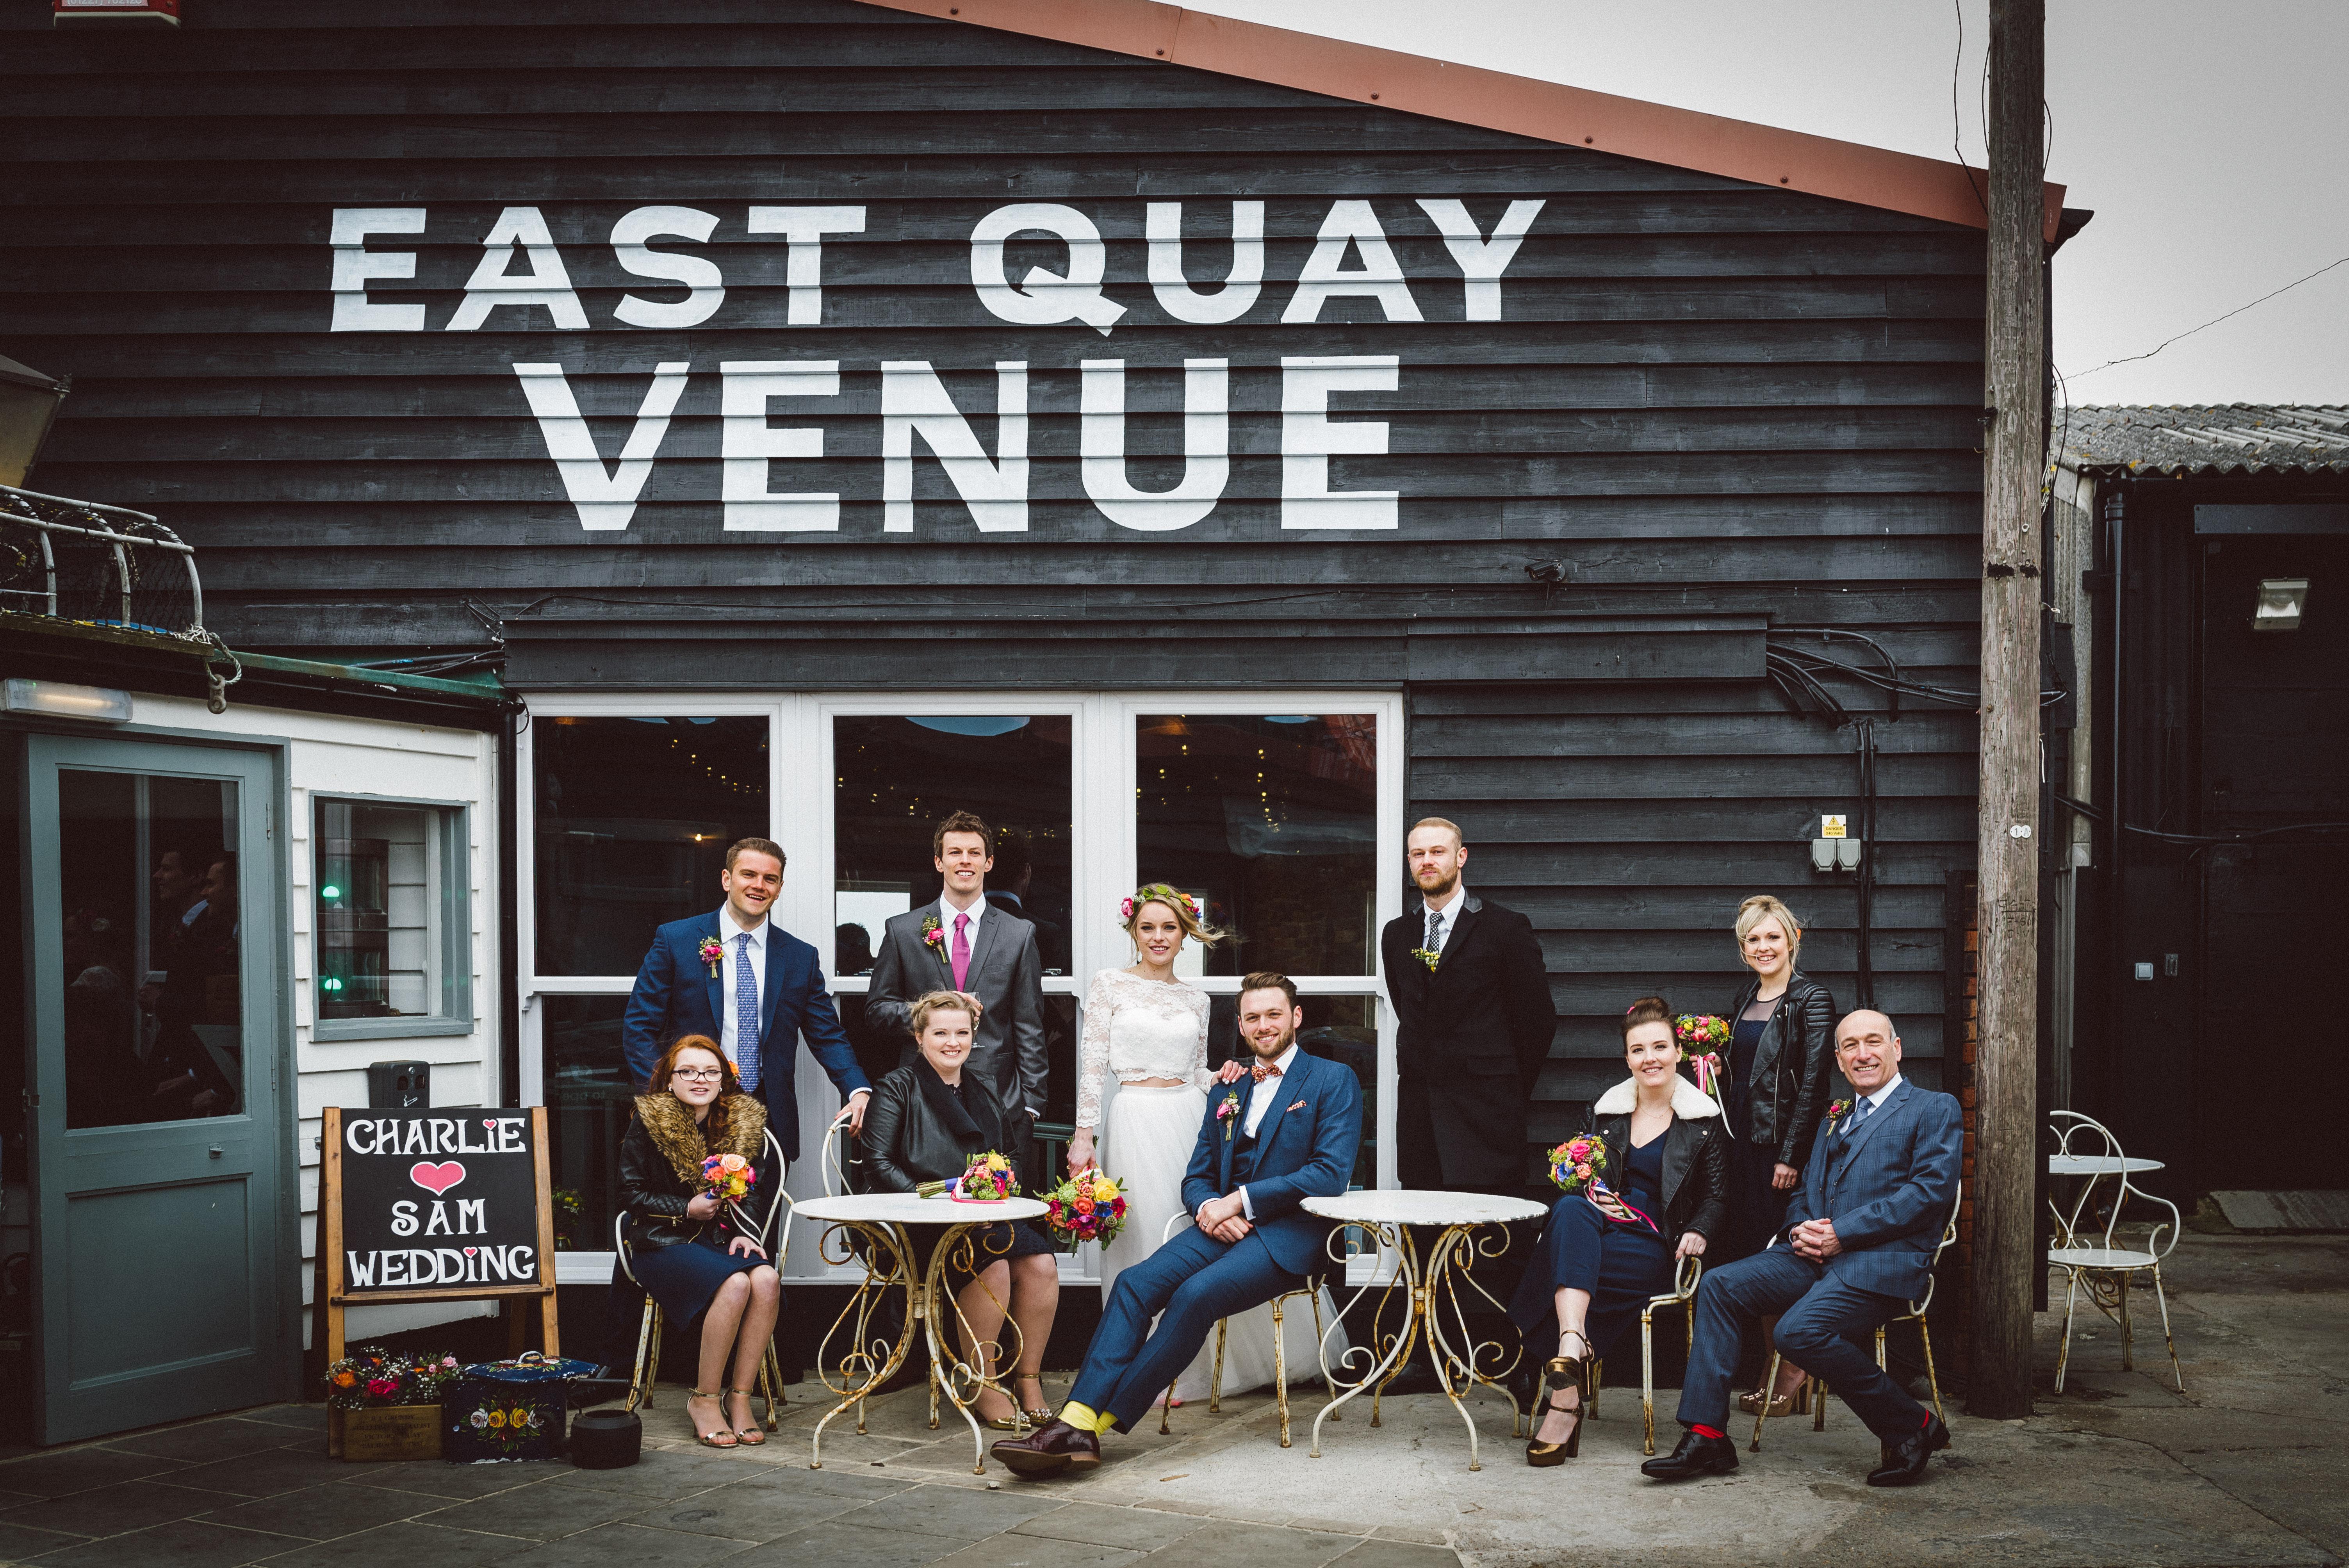 Beachside wedding & venue hire, Whitstable, Kent